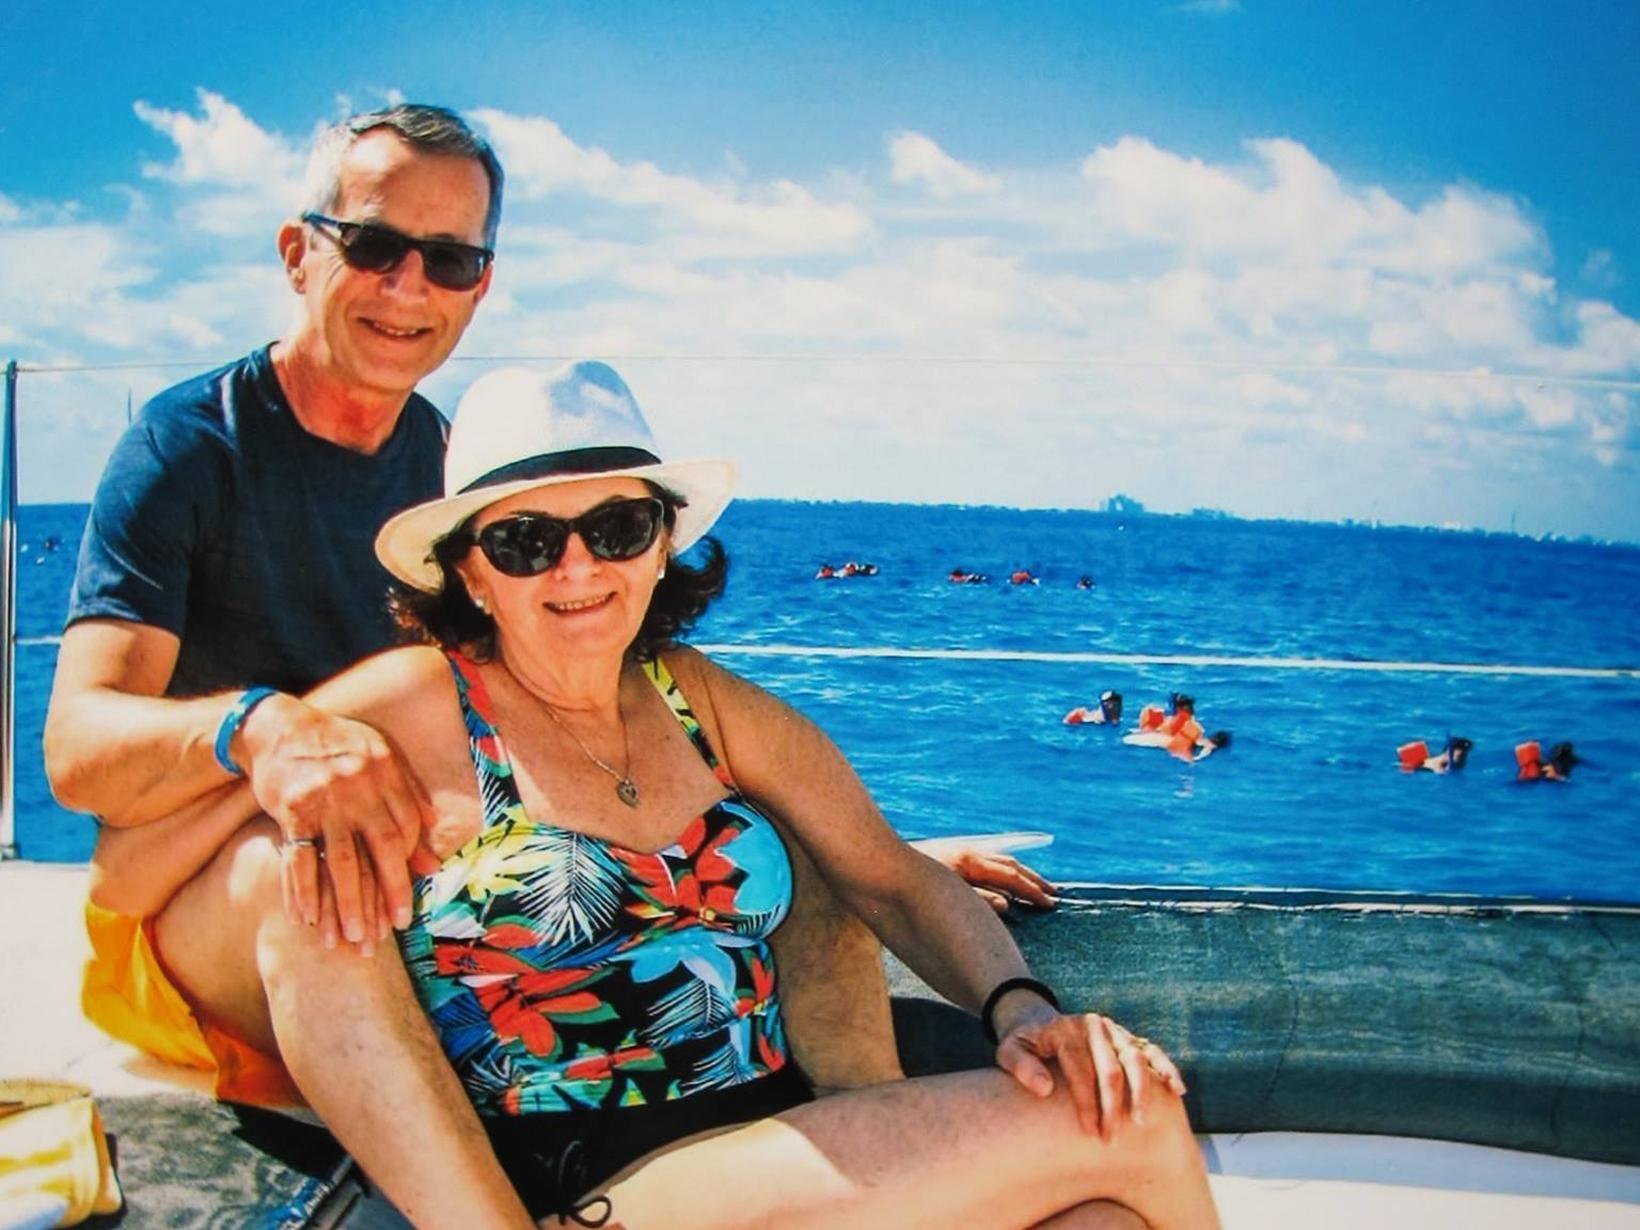 Mary & Peter from Niagara Falls Centre, Ontario, Canada